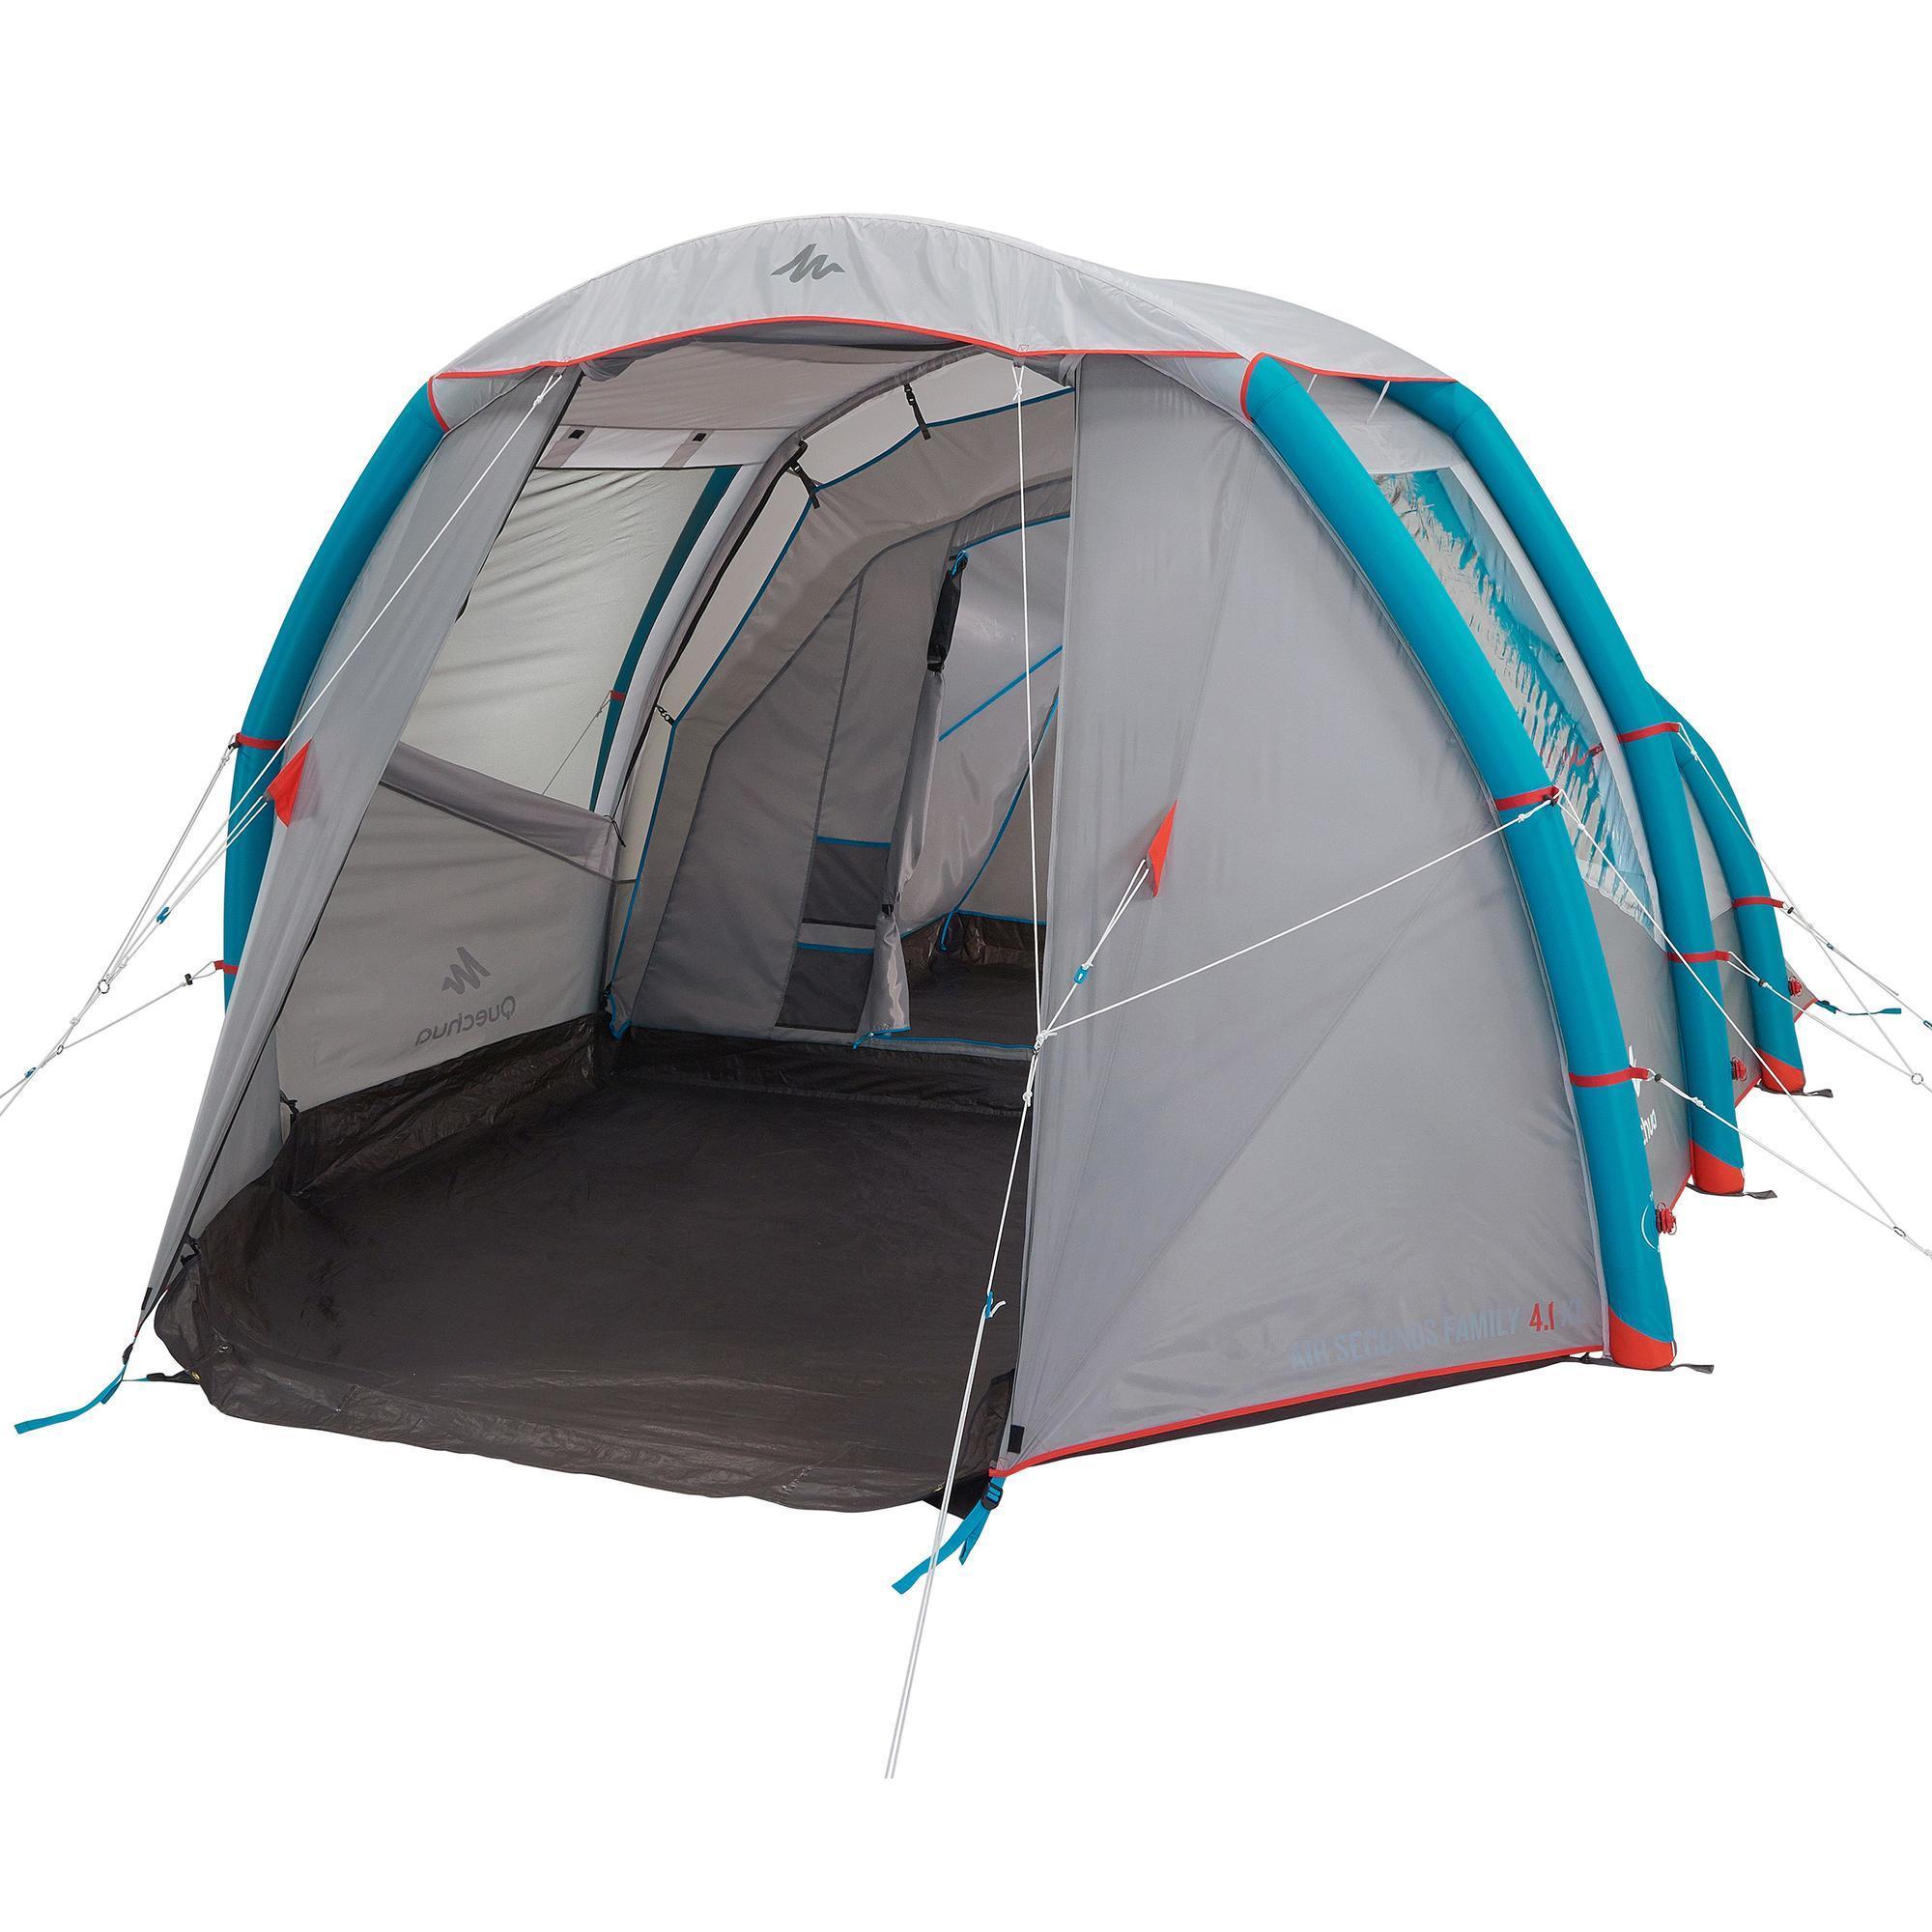 Air Seconds 4 1 xl Family Camping Tent 4 Person Quechua ~ 14011927_Camping Liegestuhl Decathlon